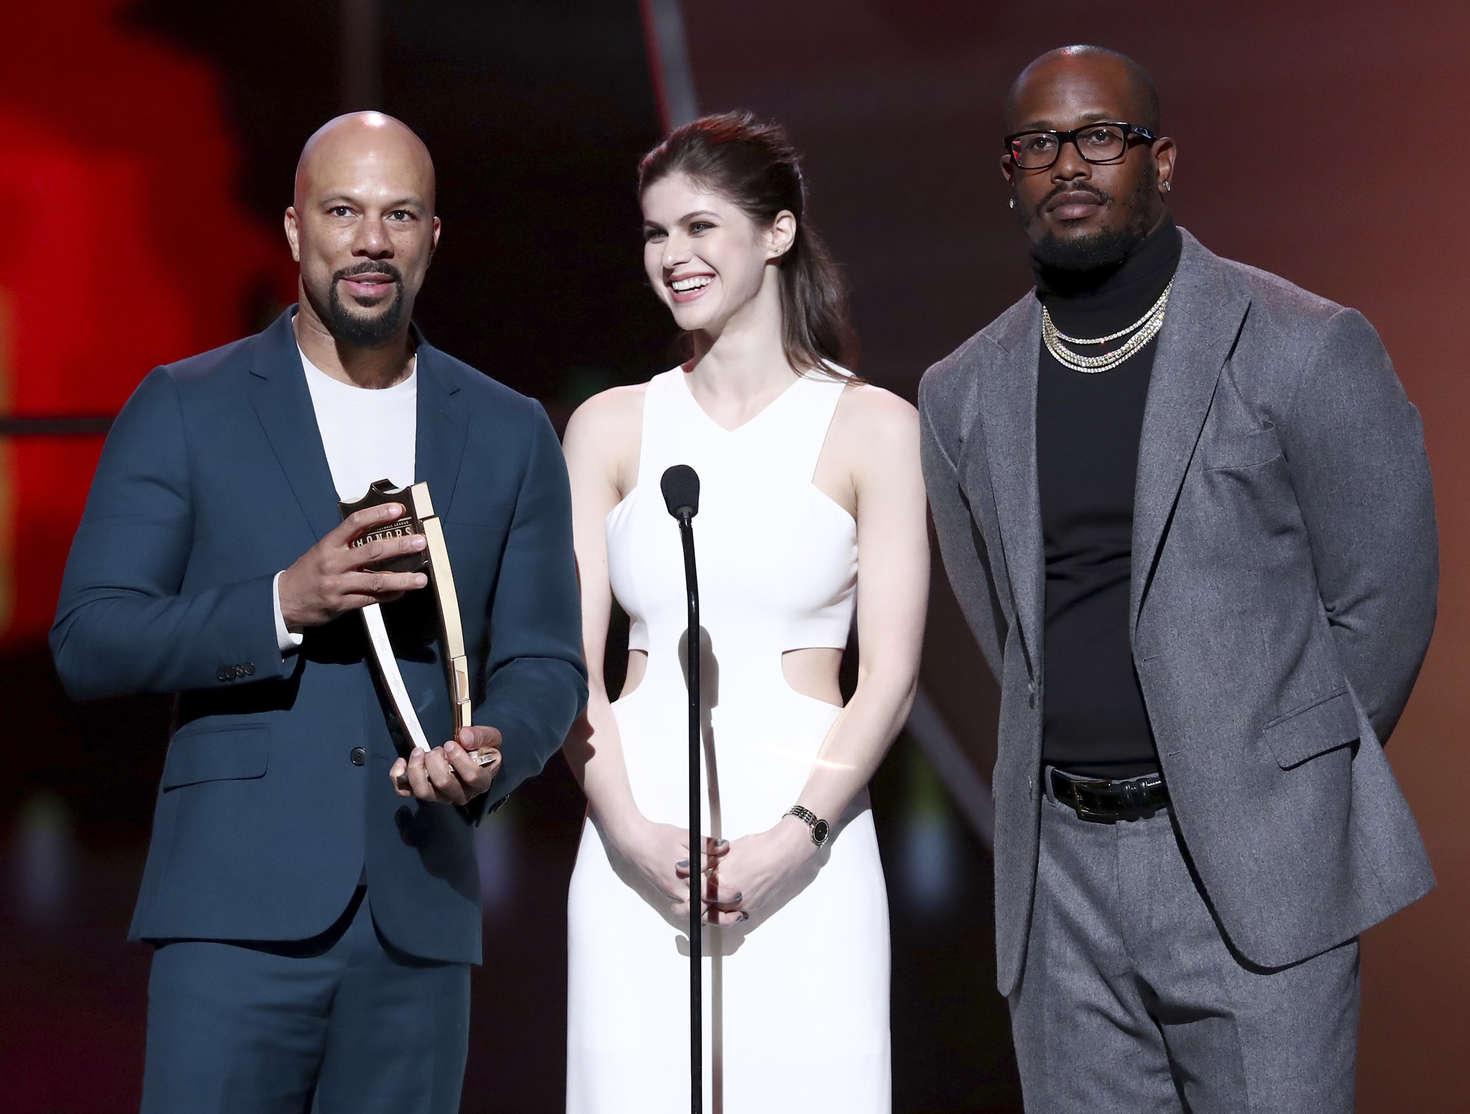 Alexandra Daddario 2017 : Alexandra Daddario: 2017 NFL Honors -10